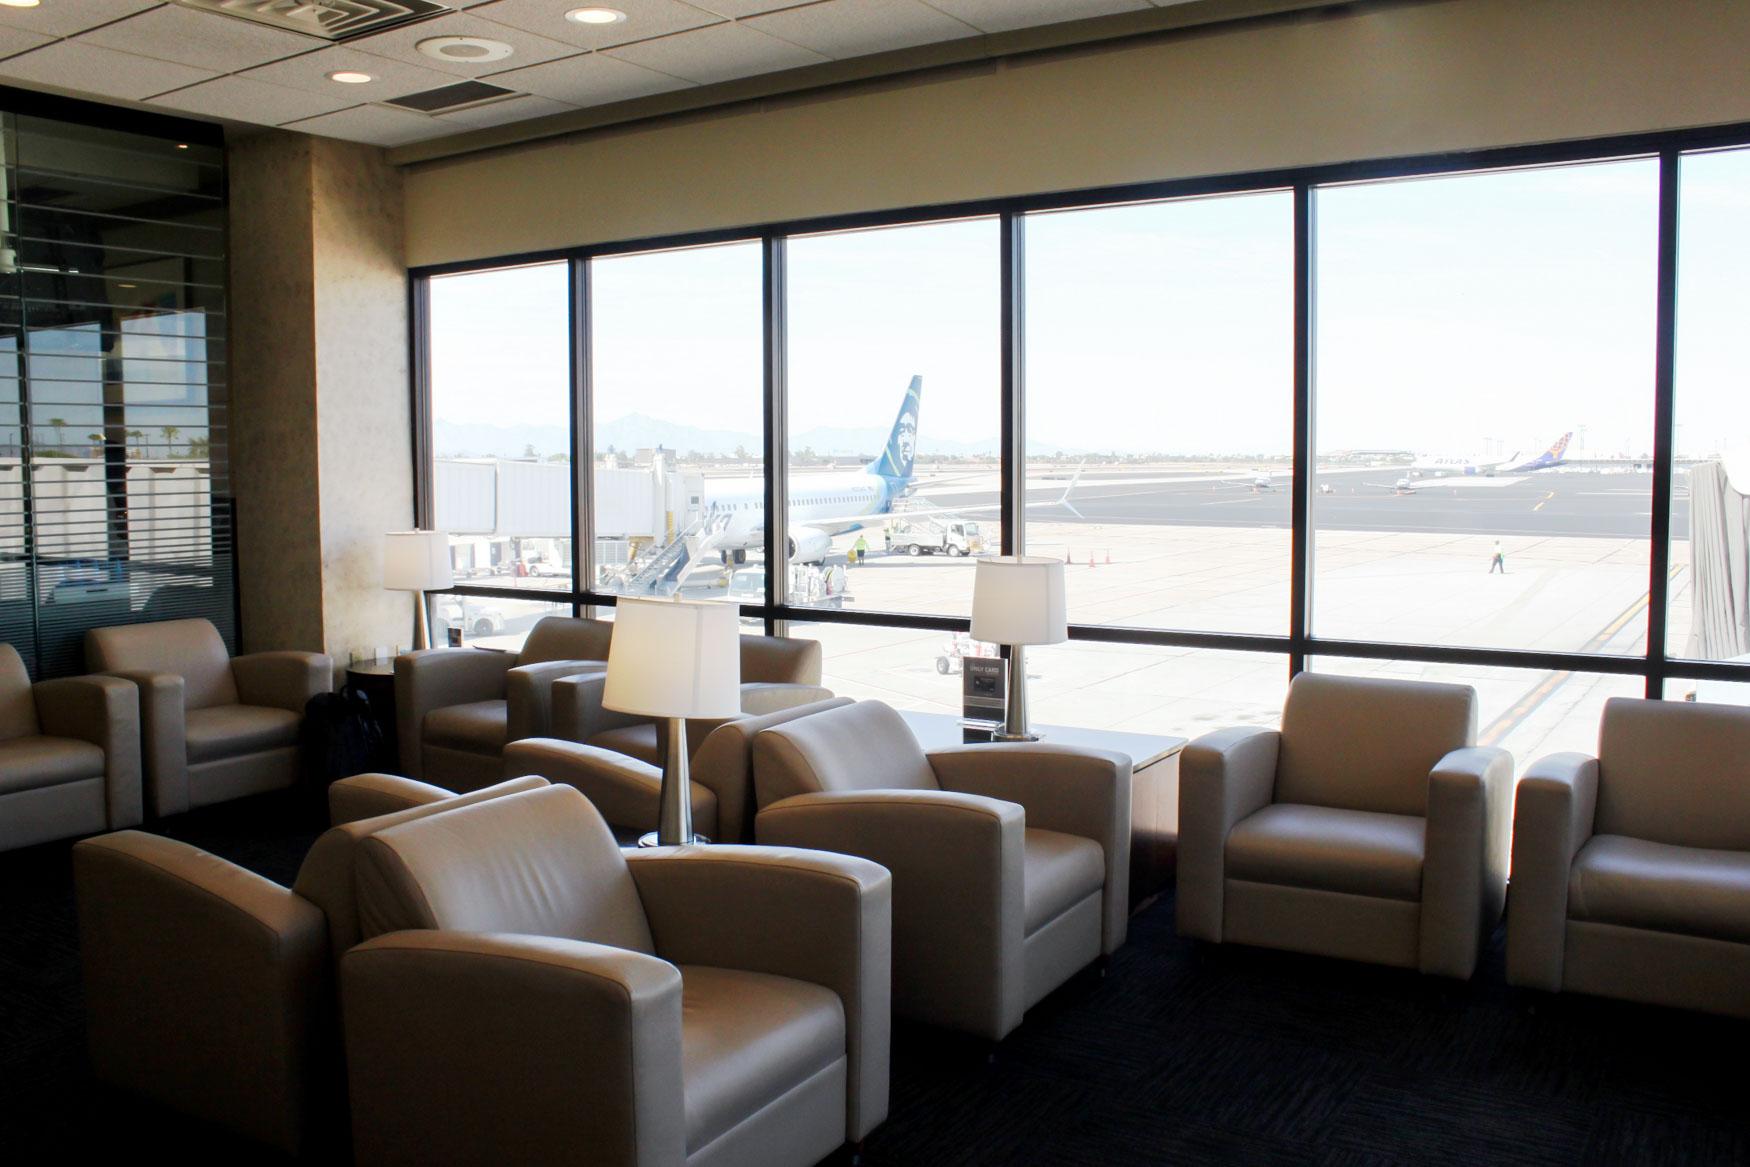 United Club Phoenix Seating